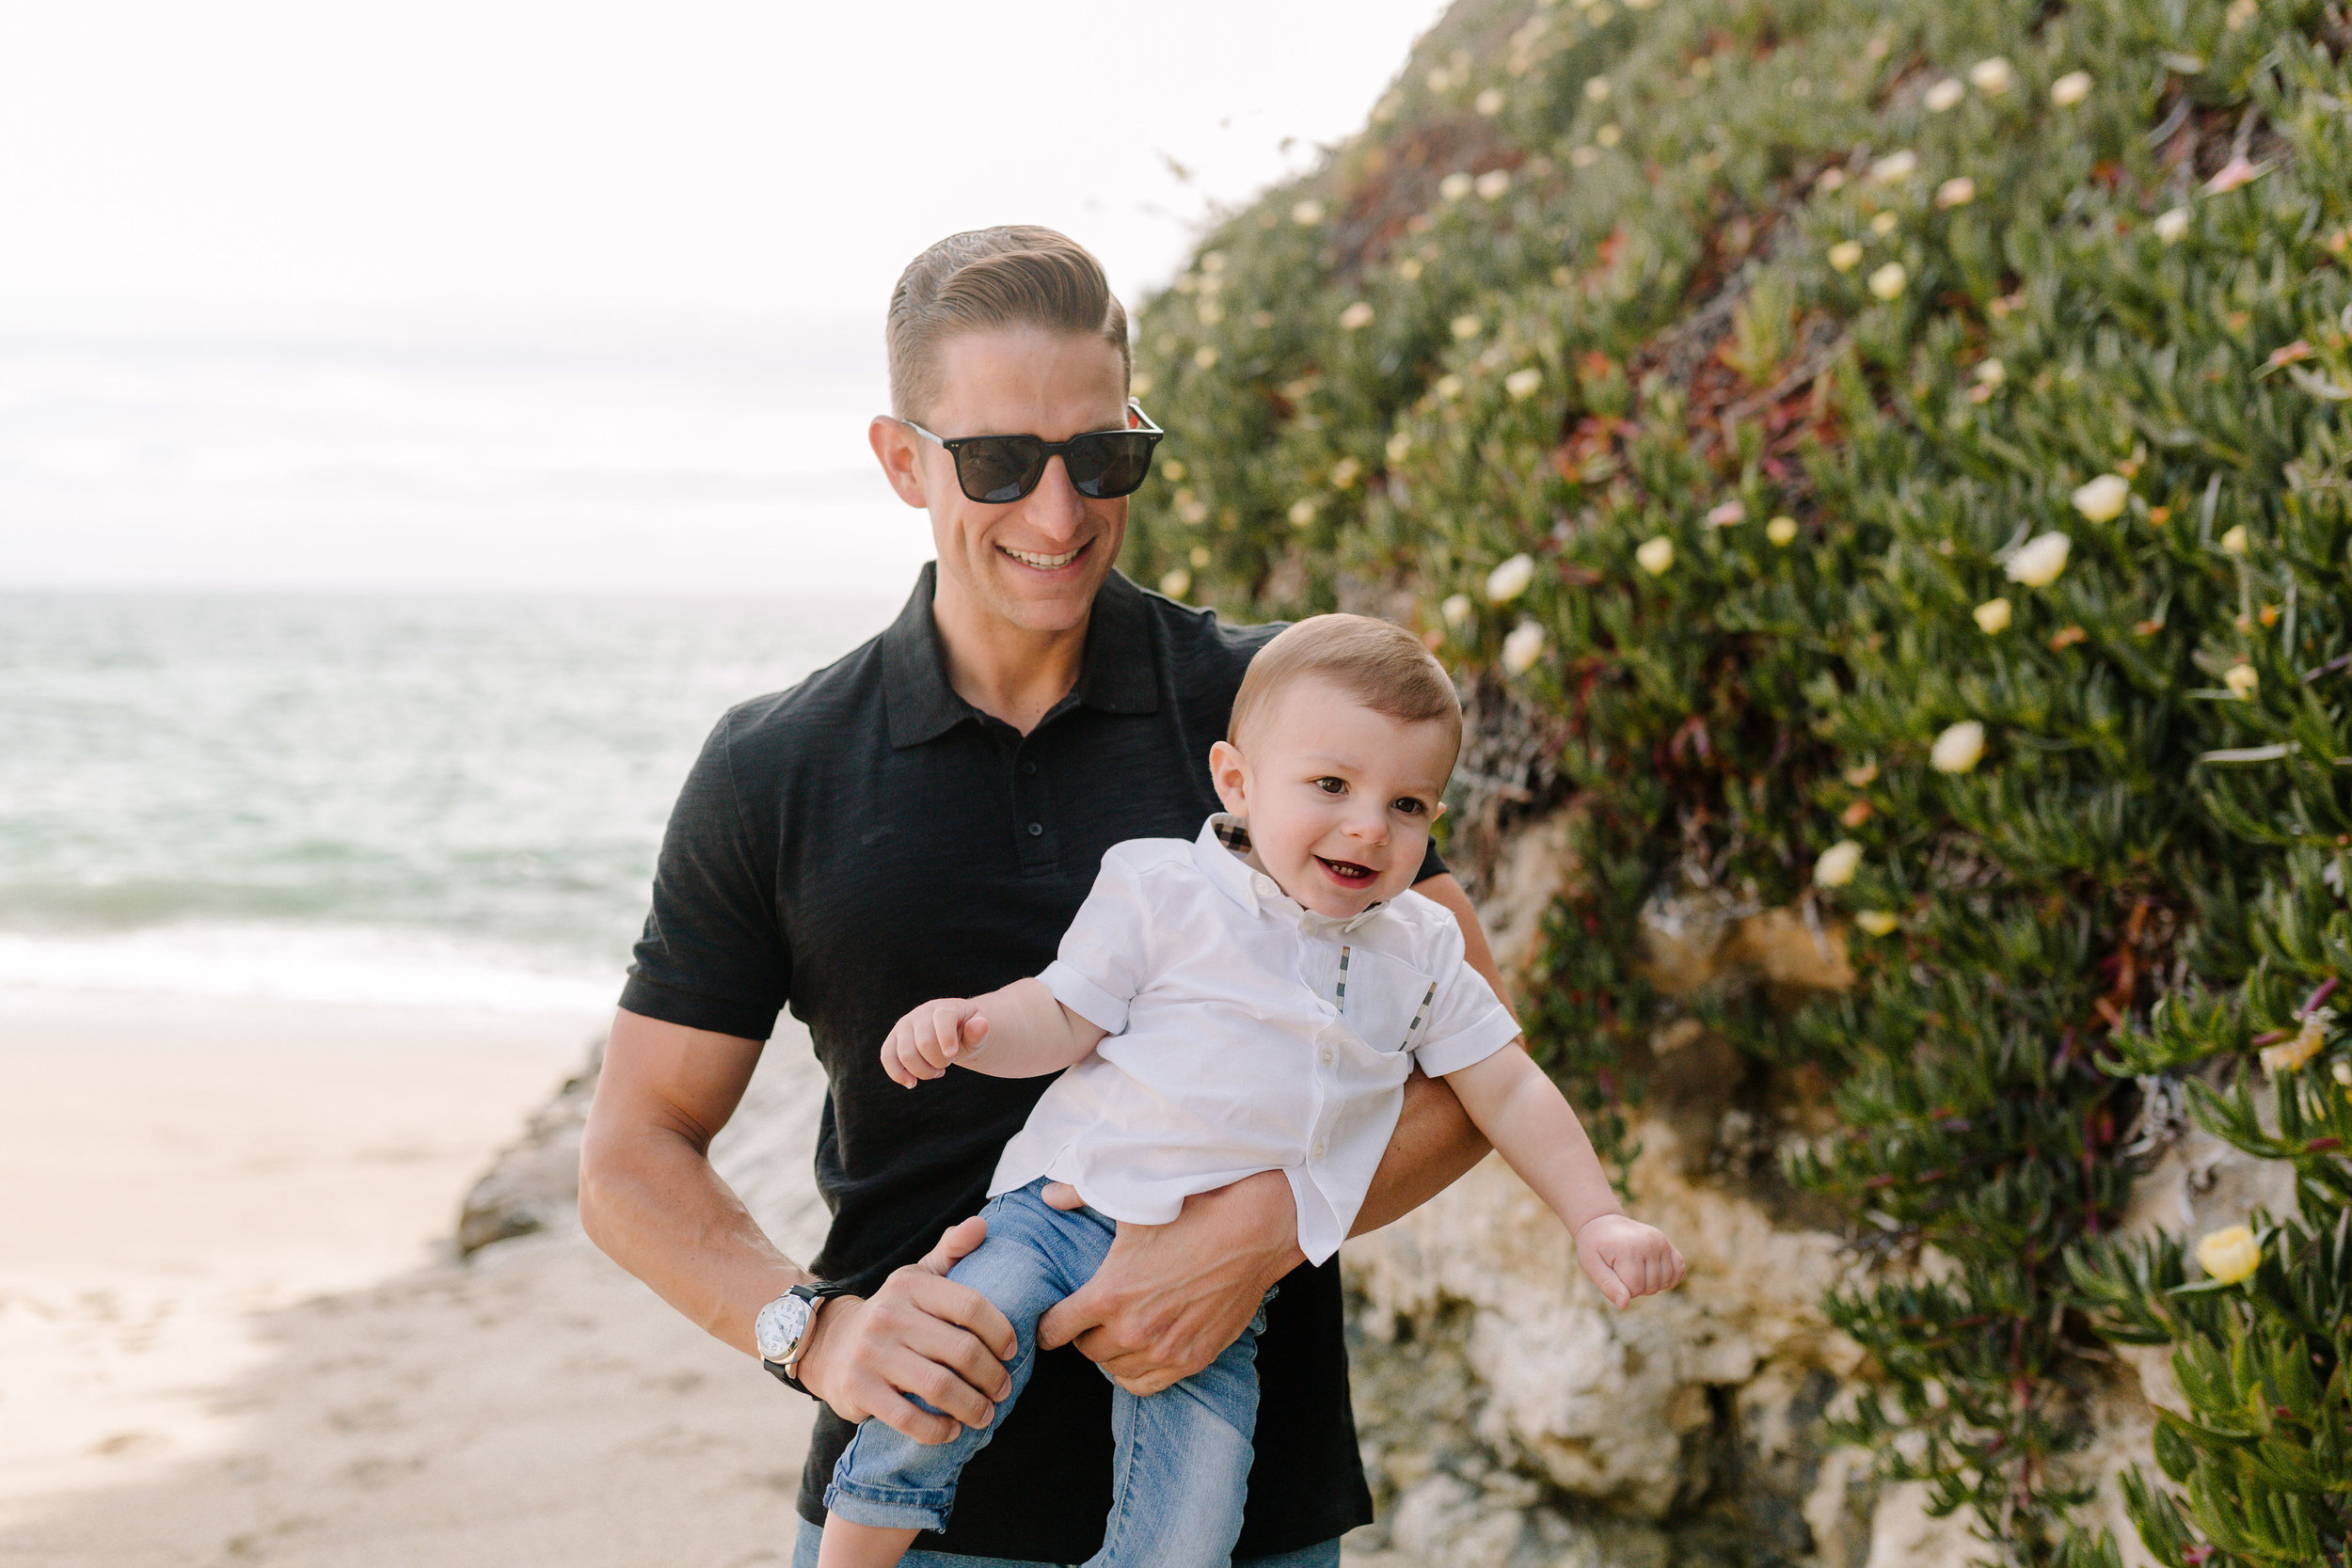 Jones family photos on the beach.  Laguna Beach photos at Table Rock Beach.  Black and white outfits for family photos.  One year old birthday photo shoot.  Baby Burberry shirt.